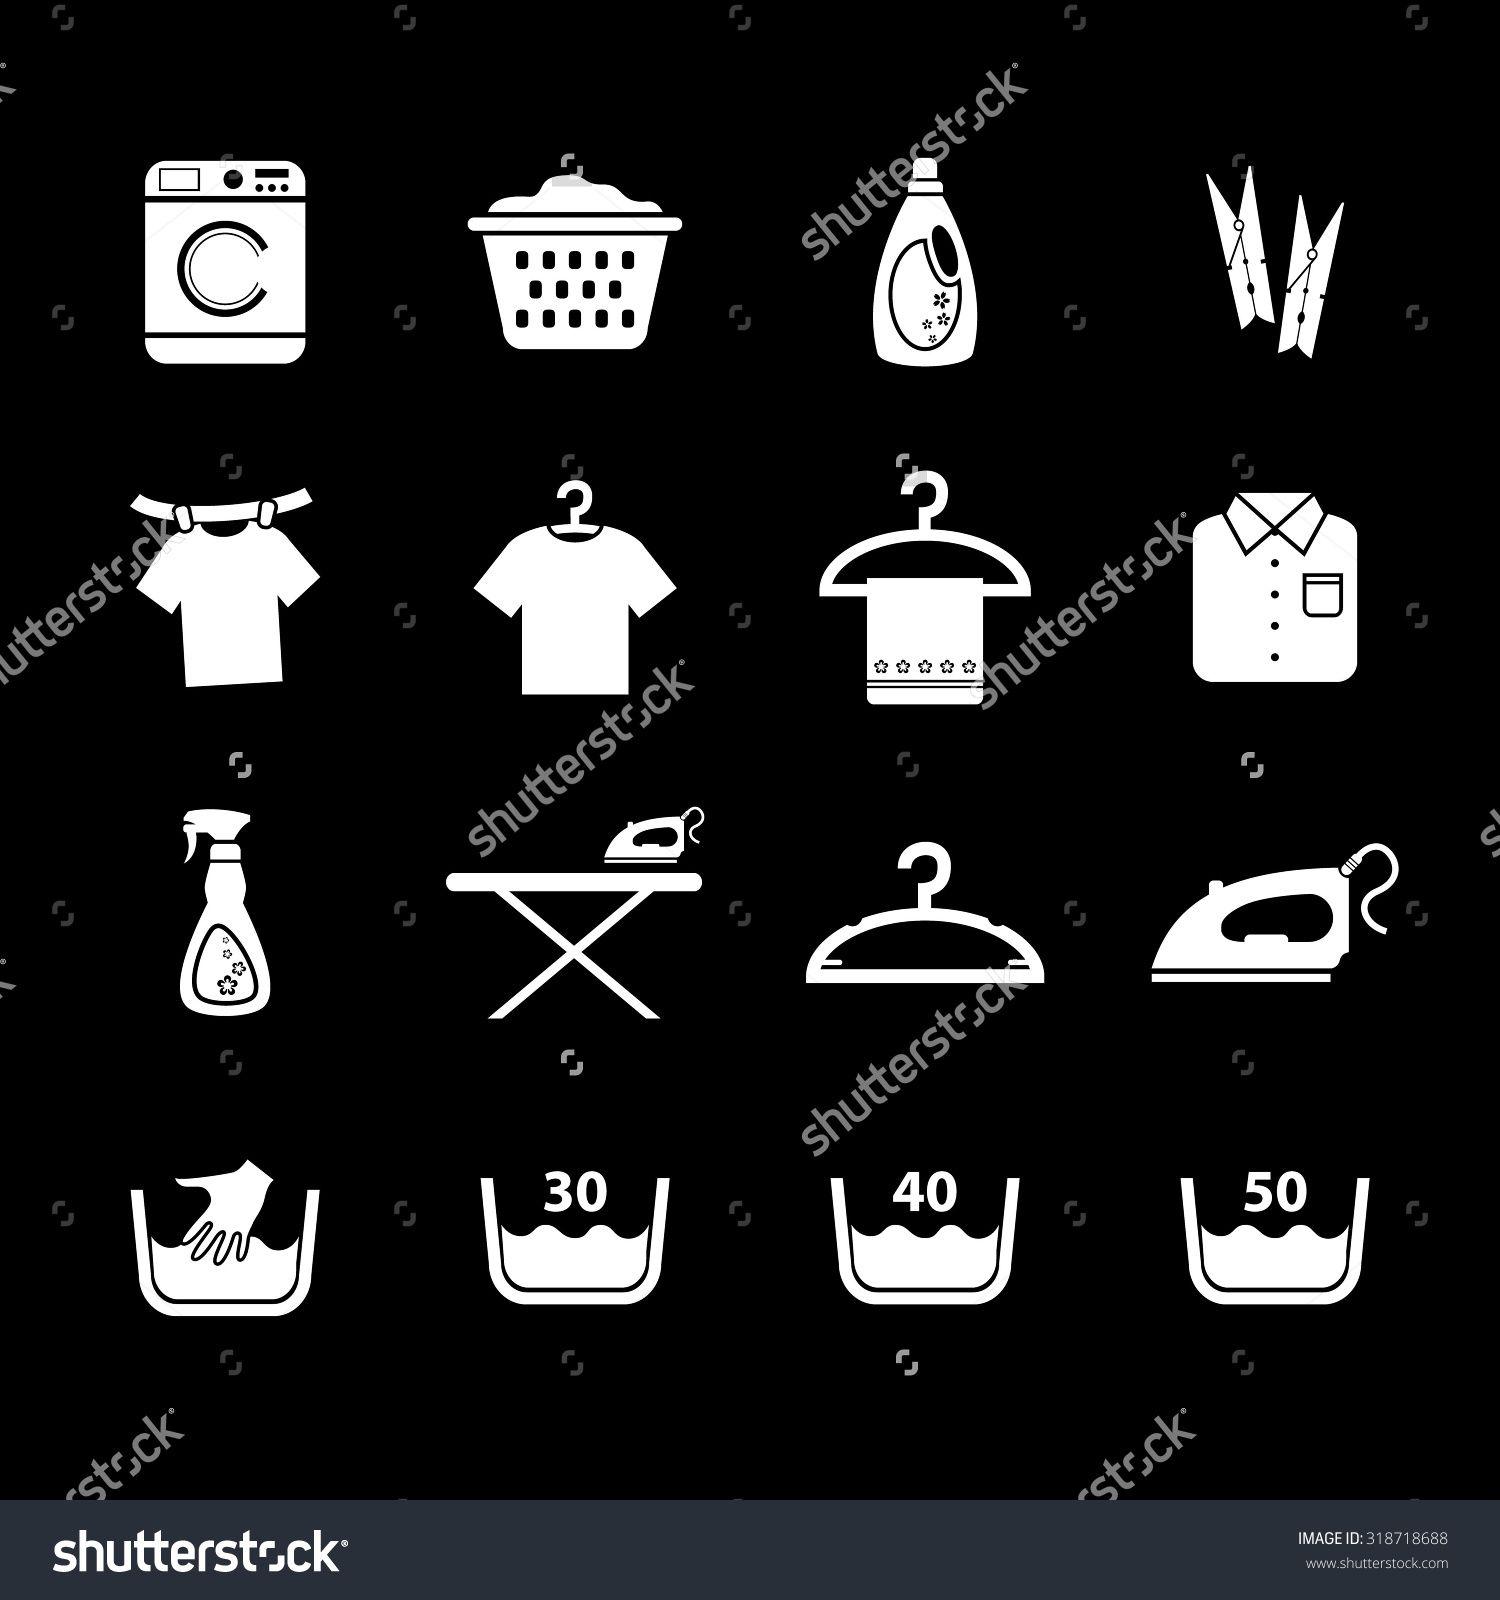 Laundry icon. Housework icon. Vector Illustration. EPS10